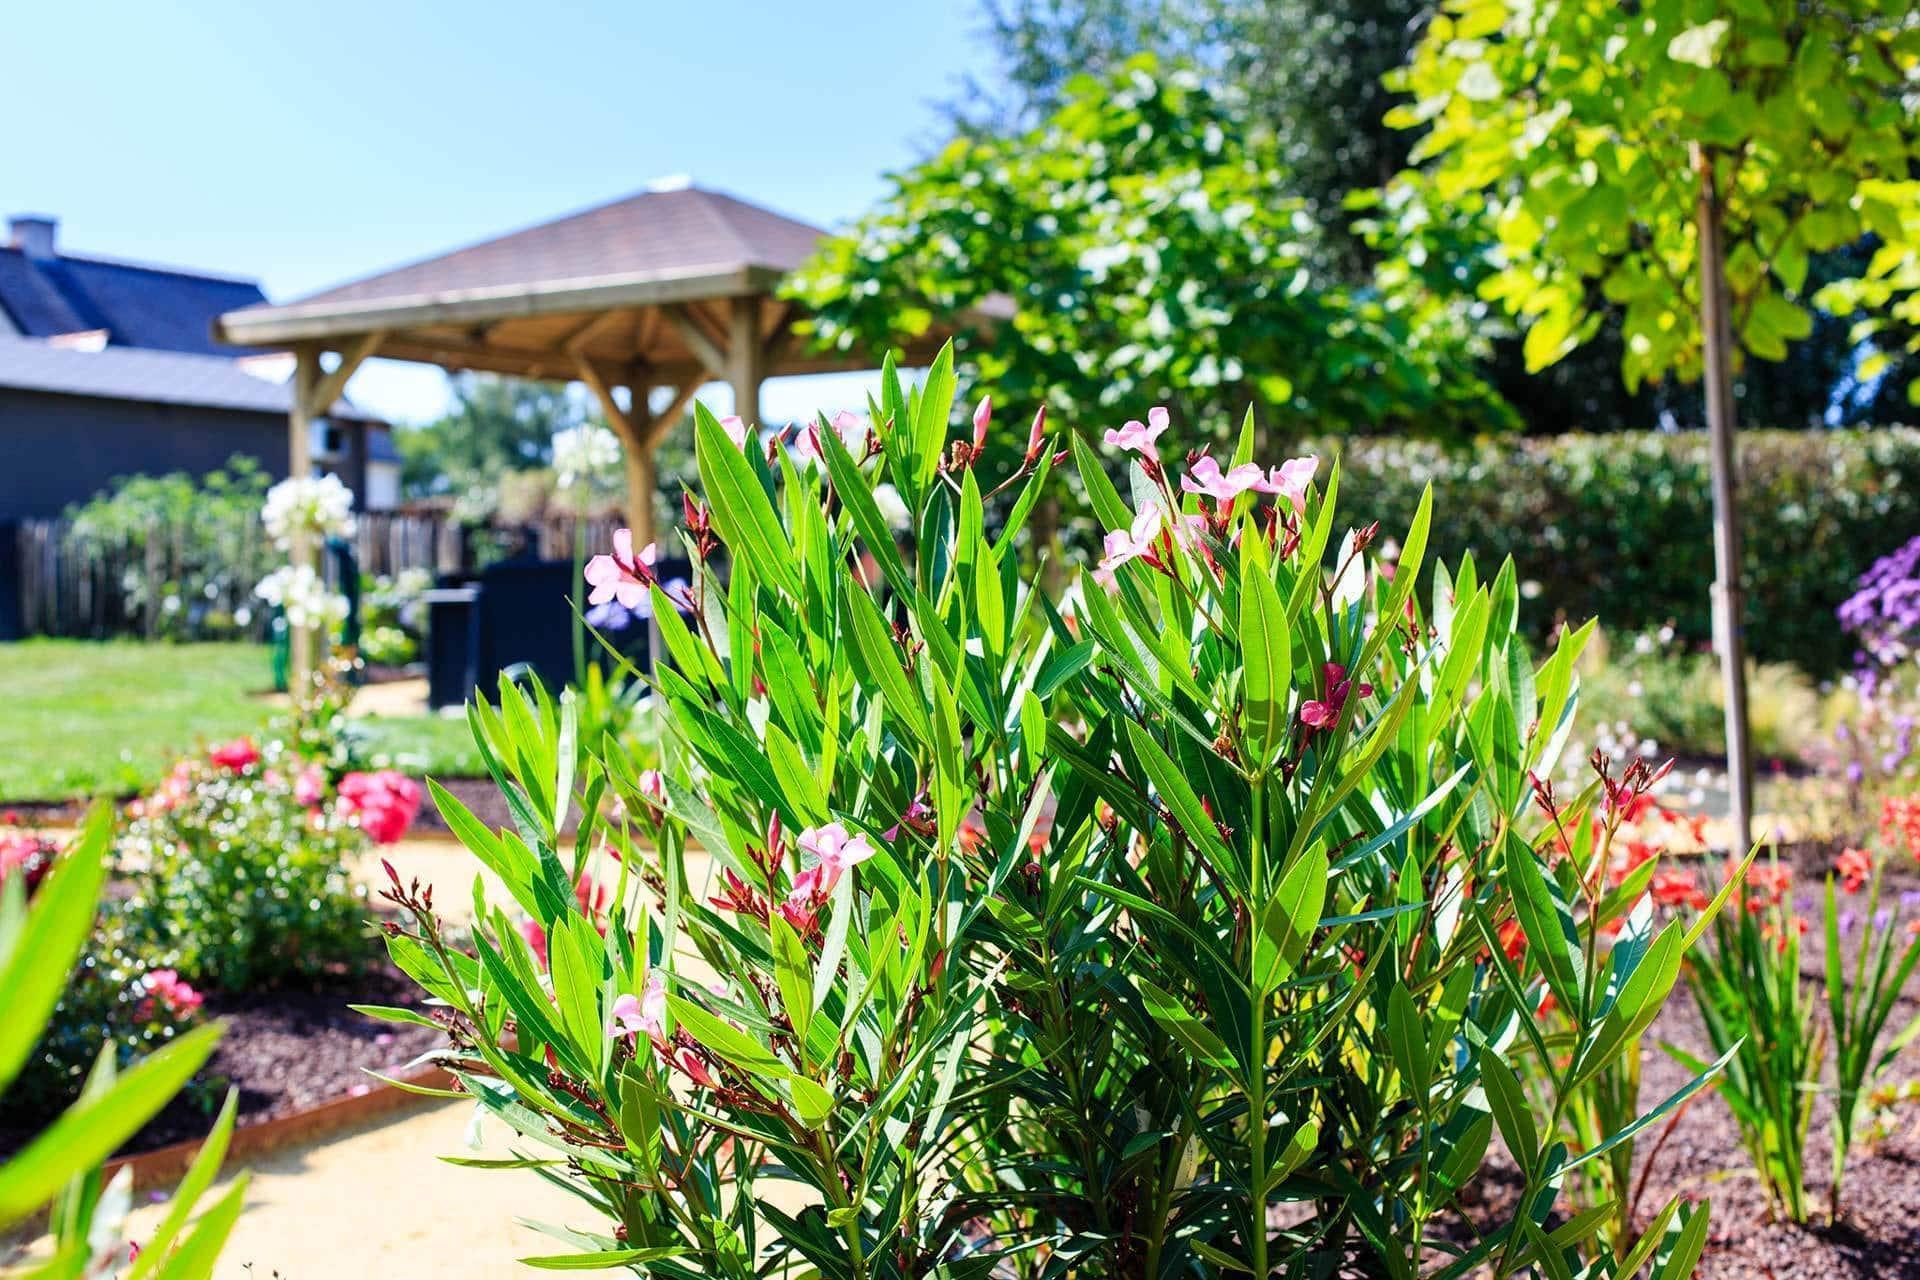 ManuPaysage - Fleurs et jardins emmanuel loirat paysagiste herbignac guerande la baule 1